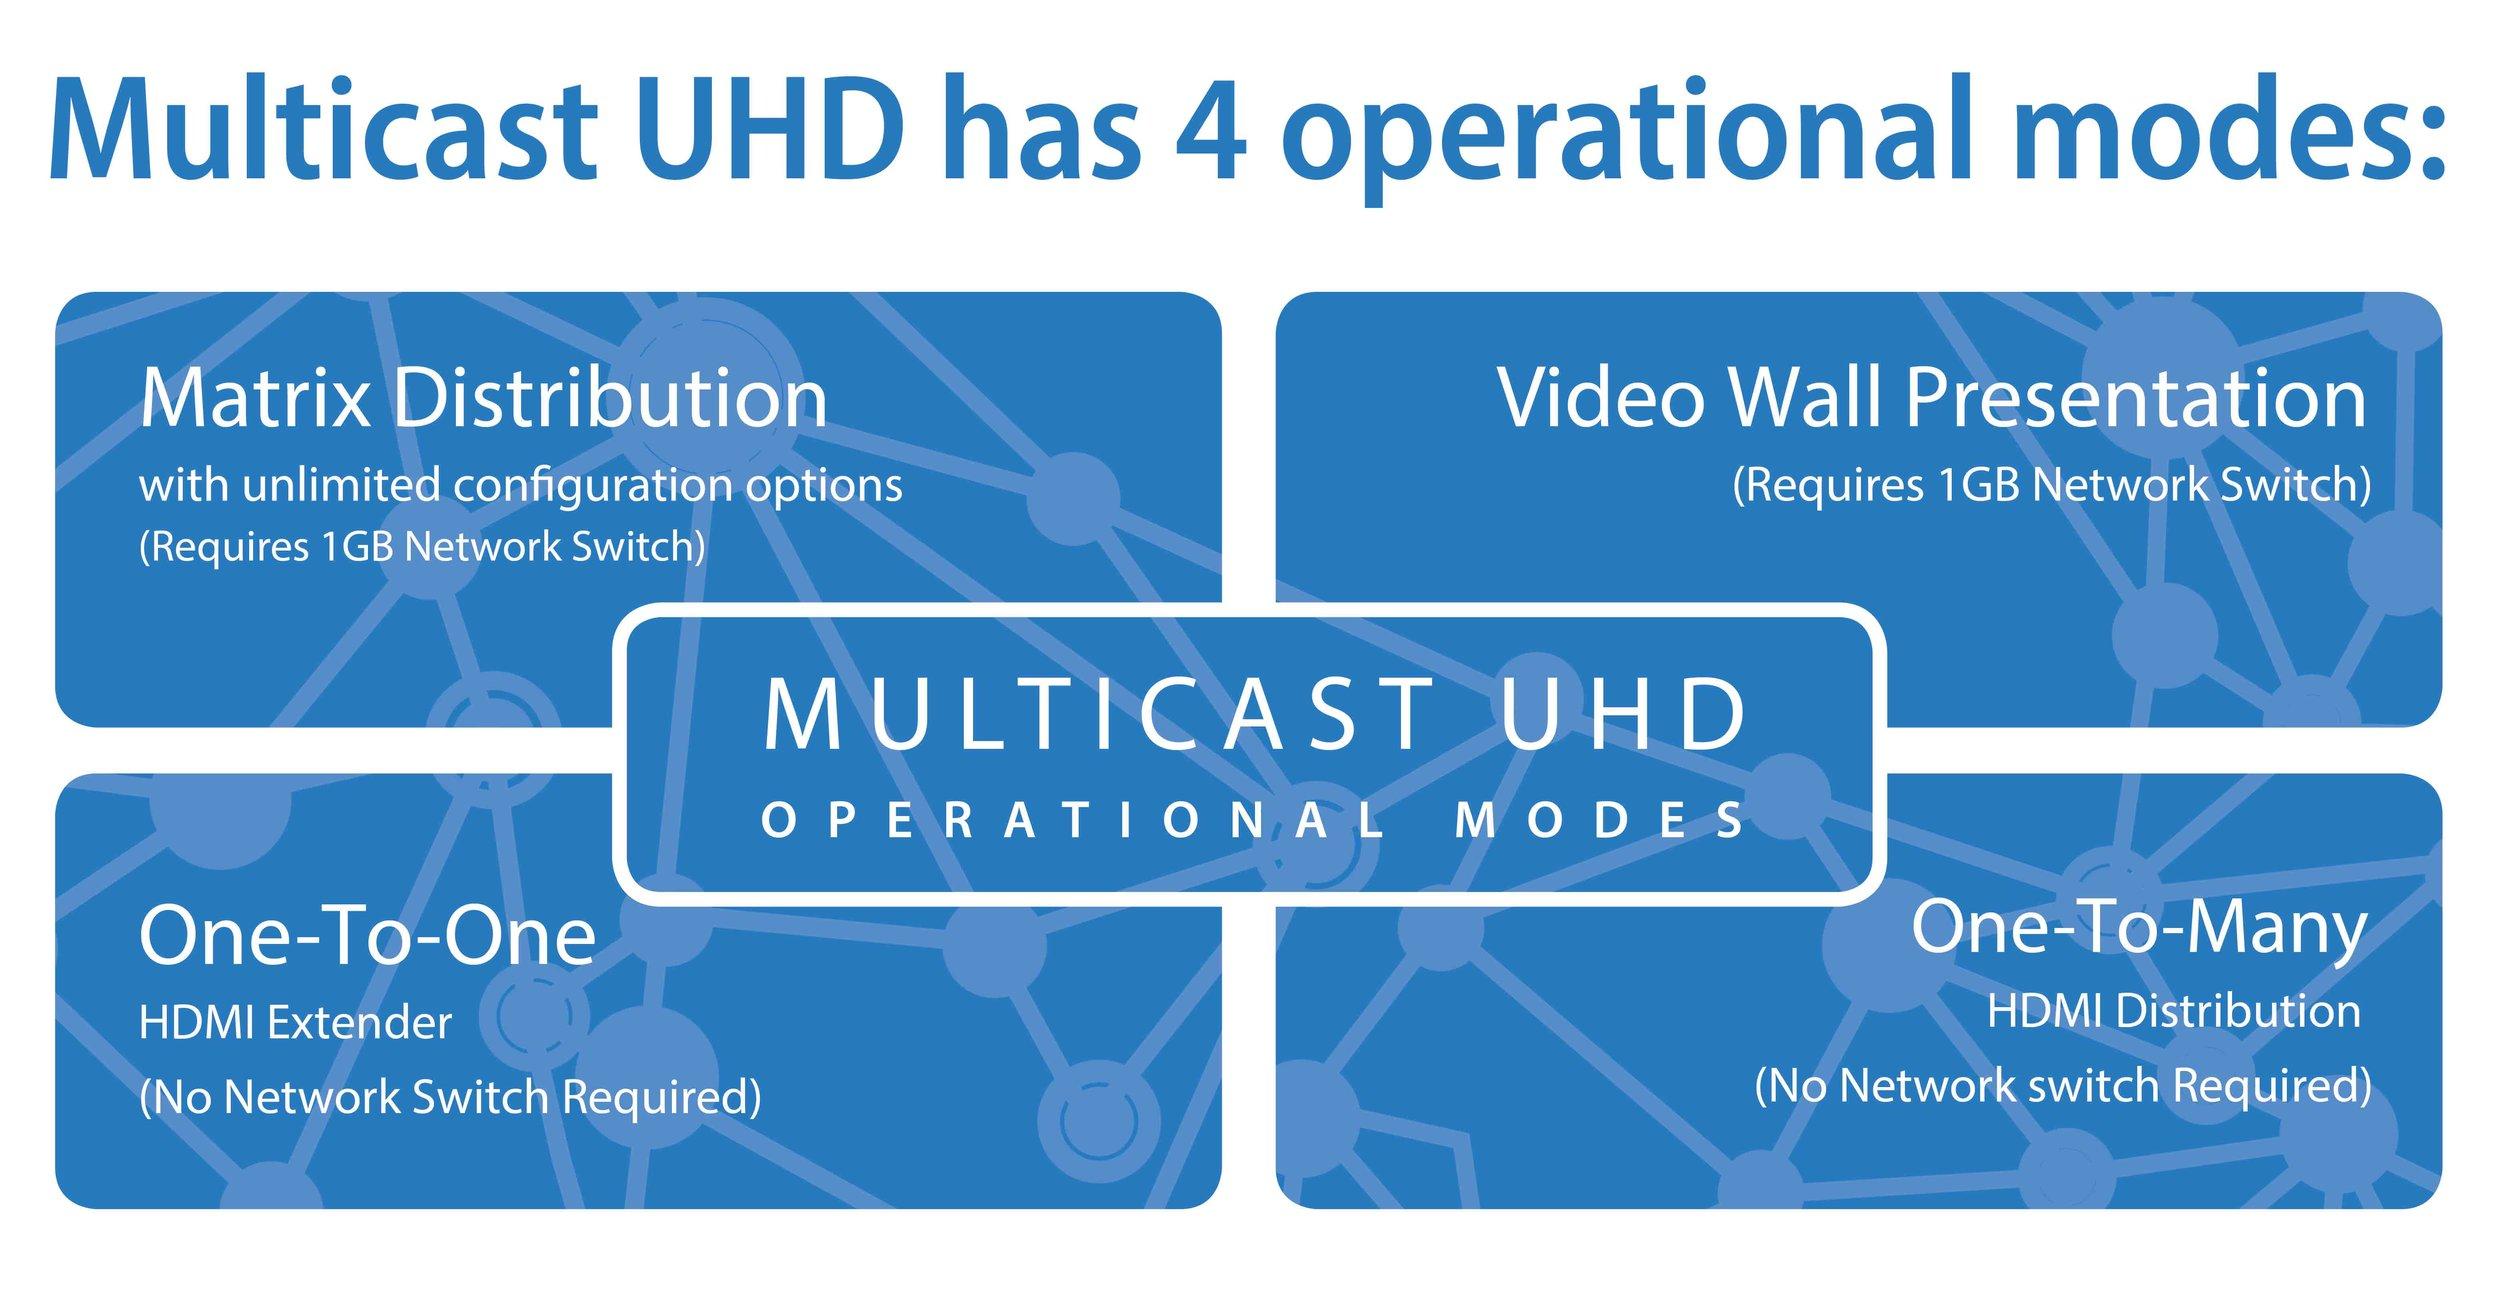 Multicast_UHD_Modes.jpg